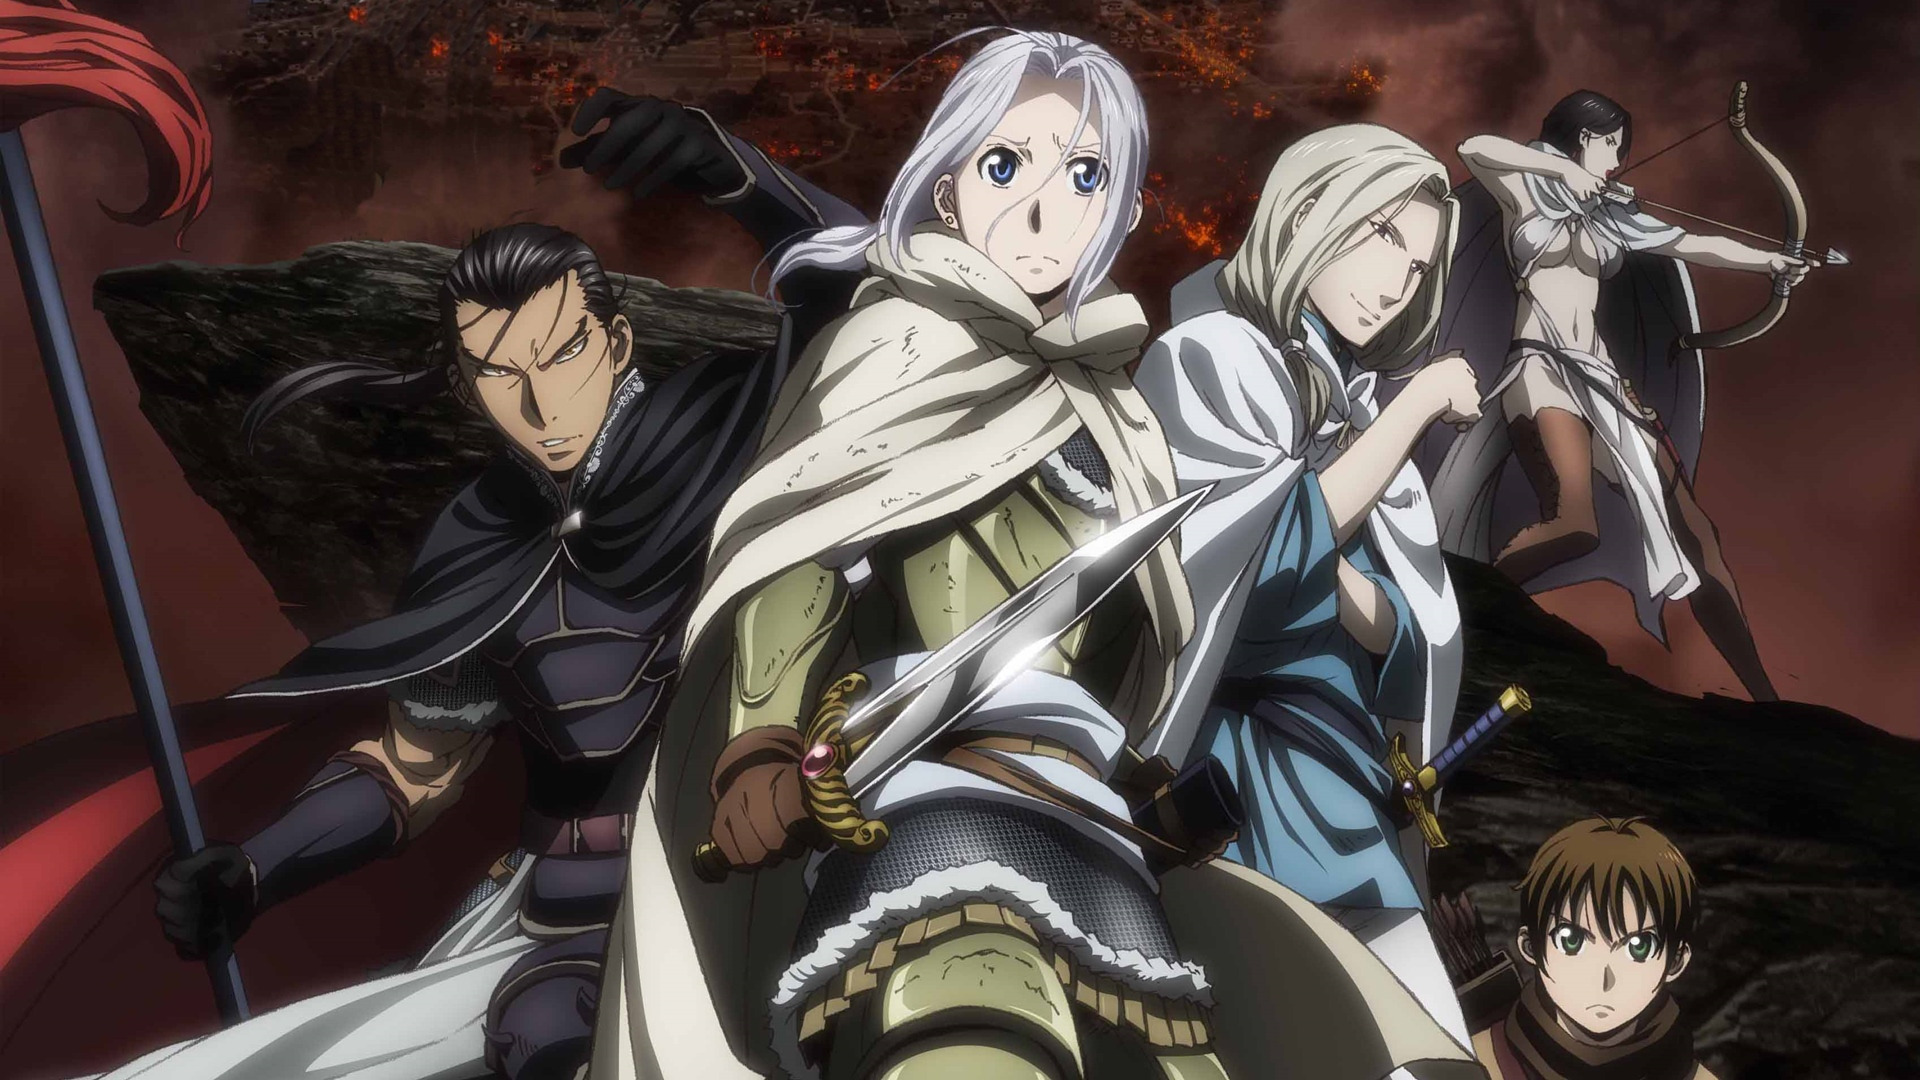 Anime The Heroic Legend of Arslan